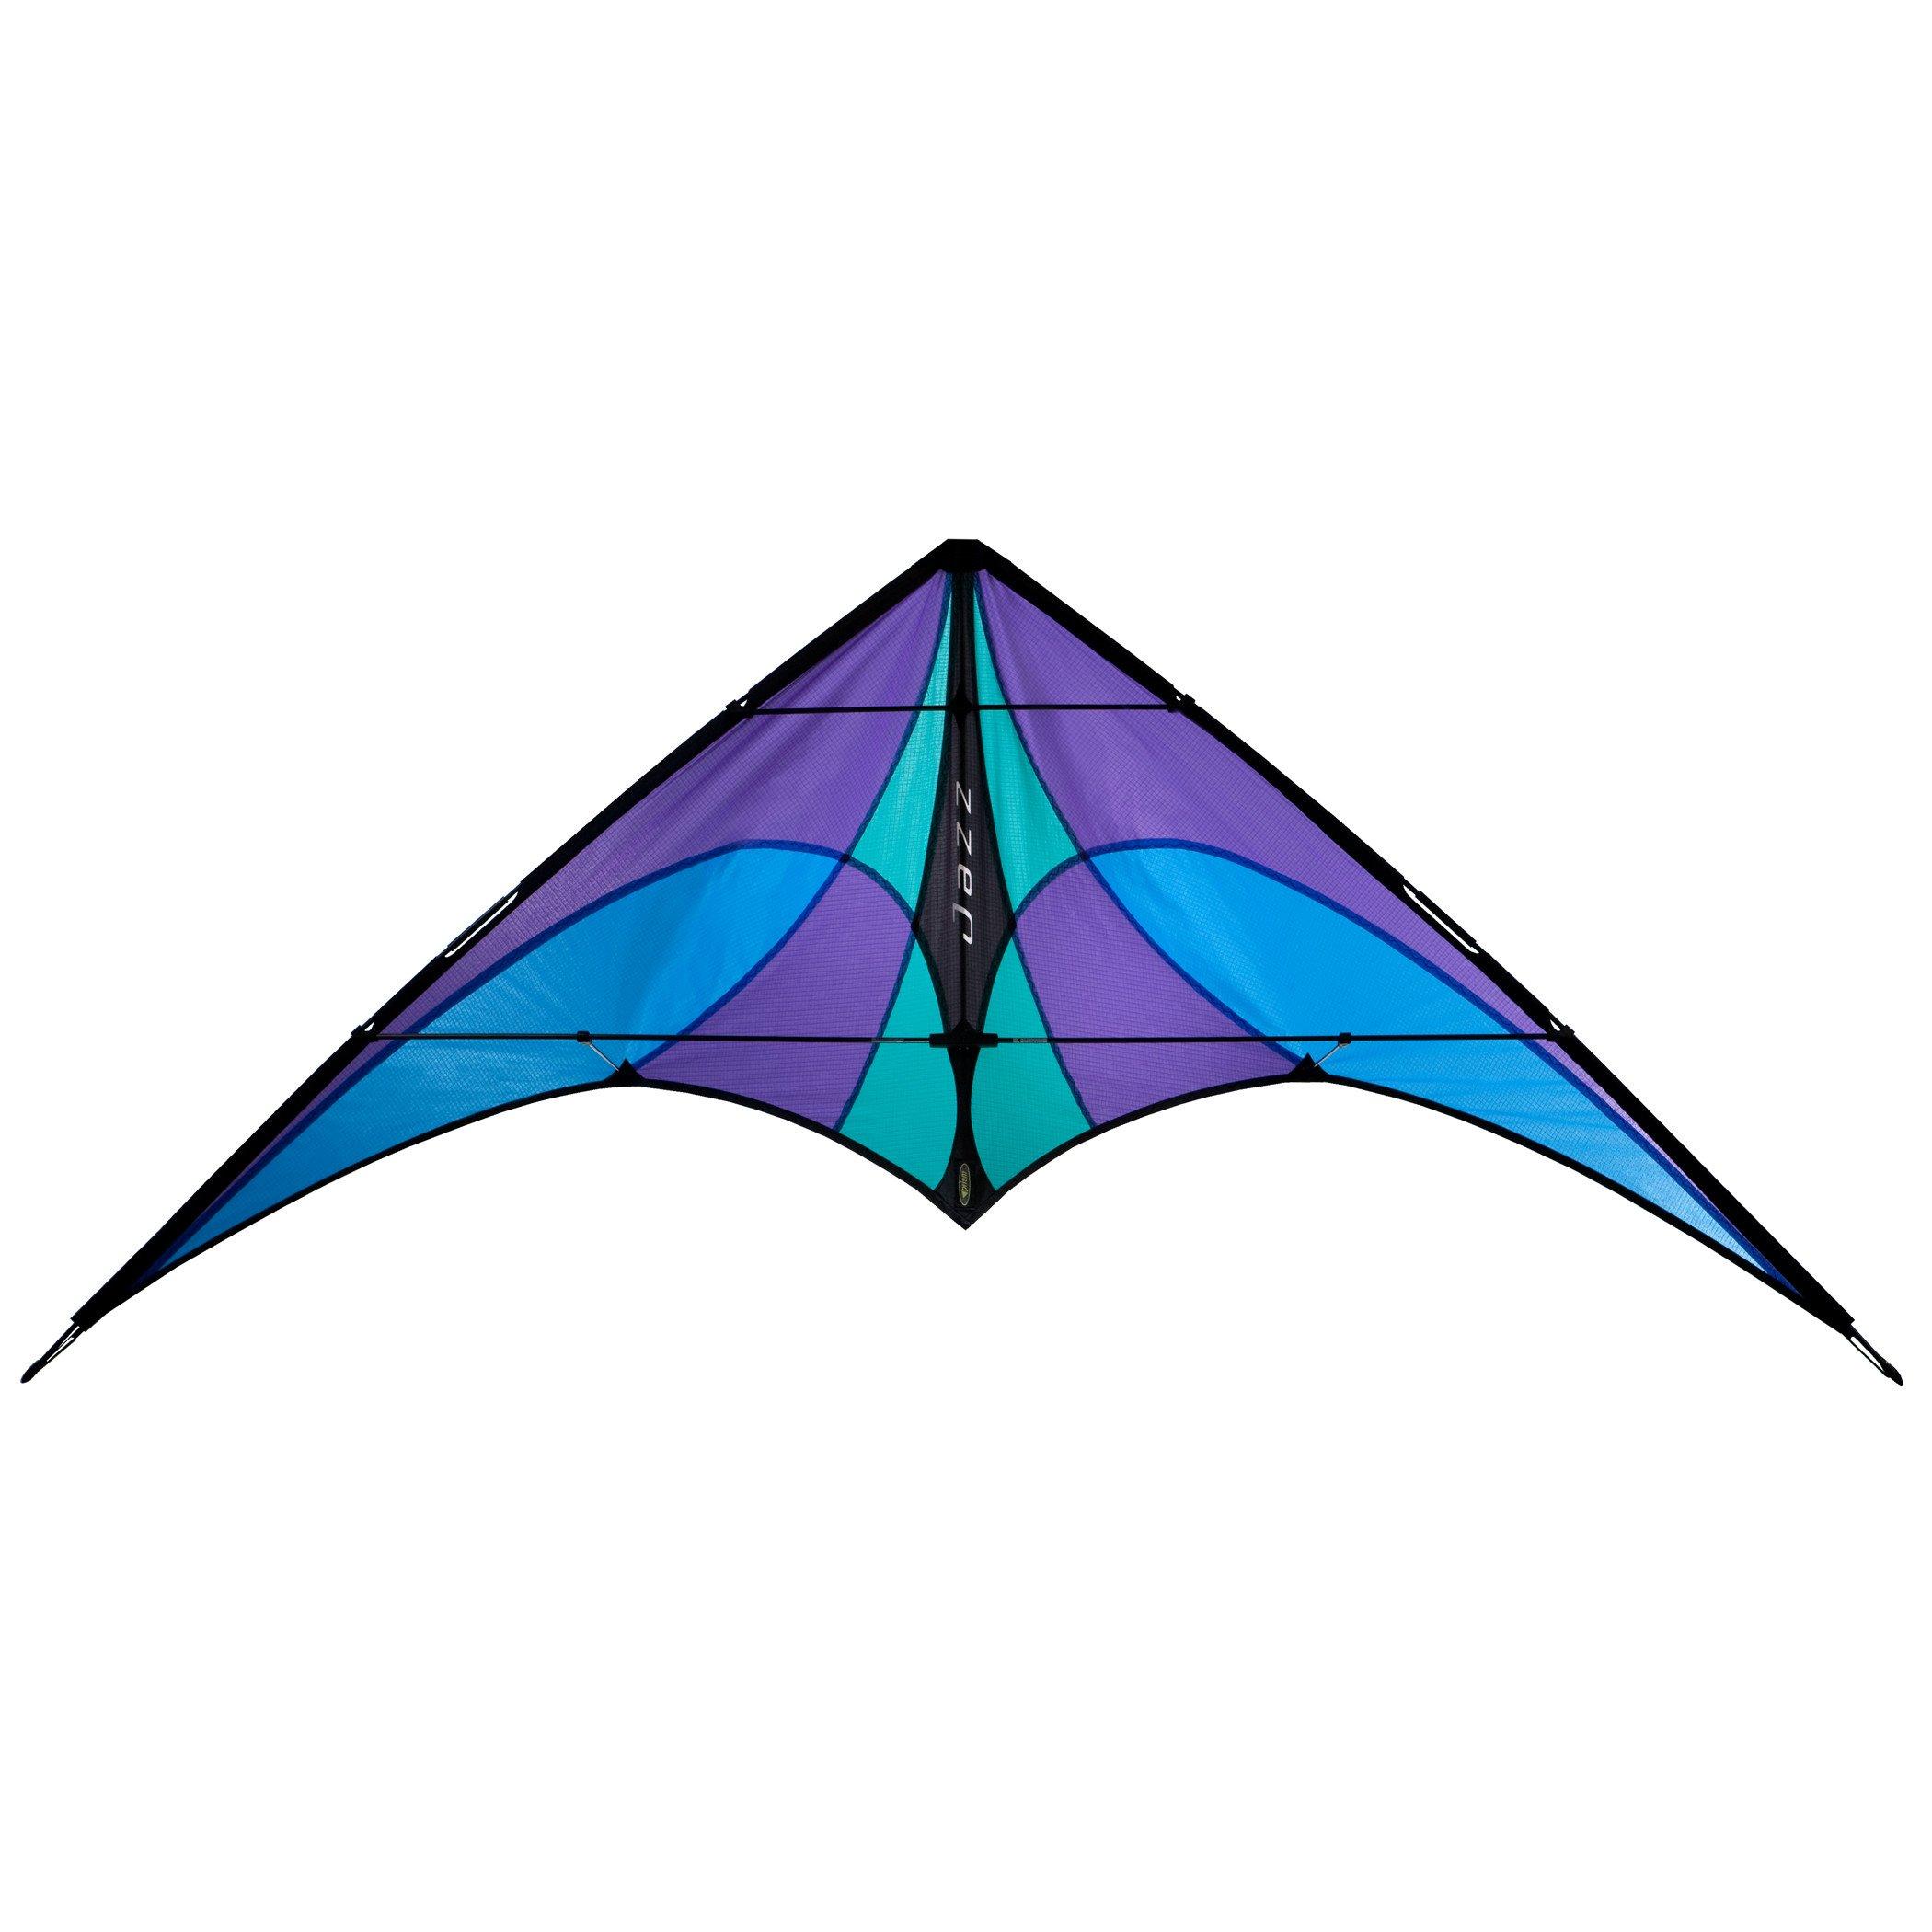 Prism Jazz Dual-line Stunt Kite, Ice by Prism Kite Technology